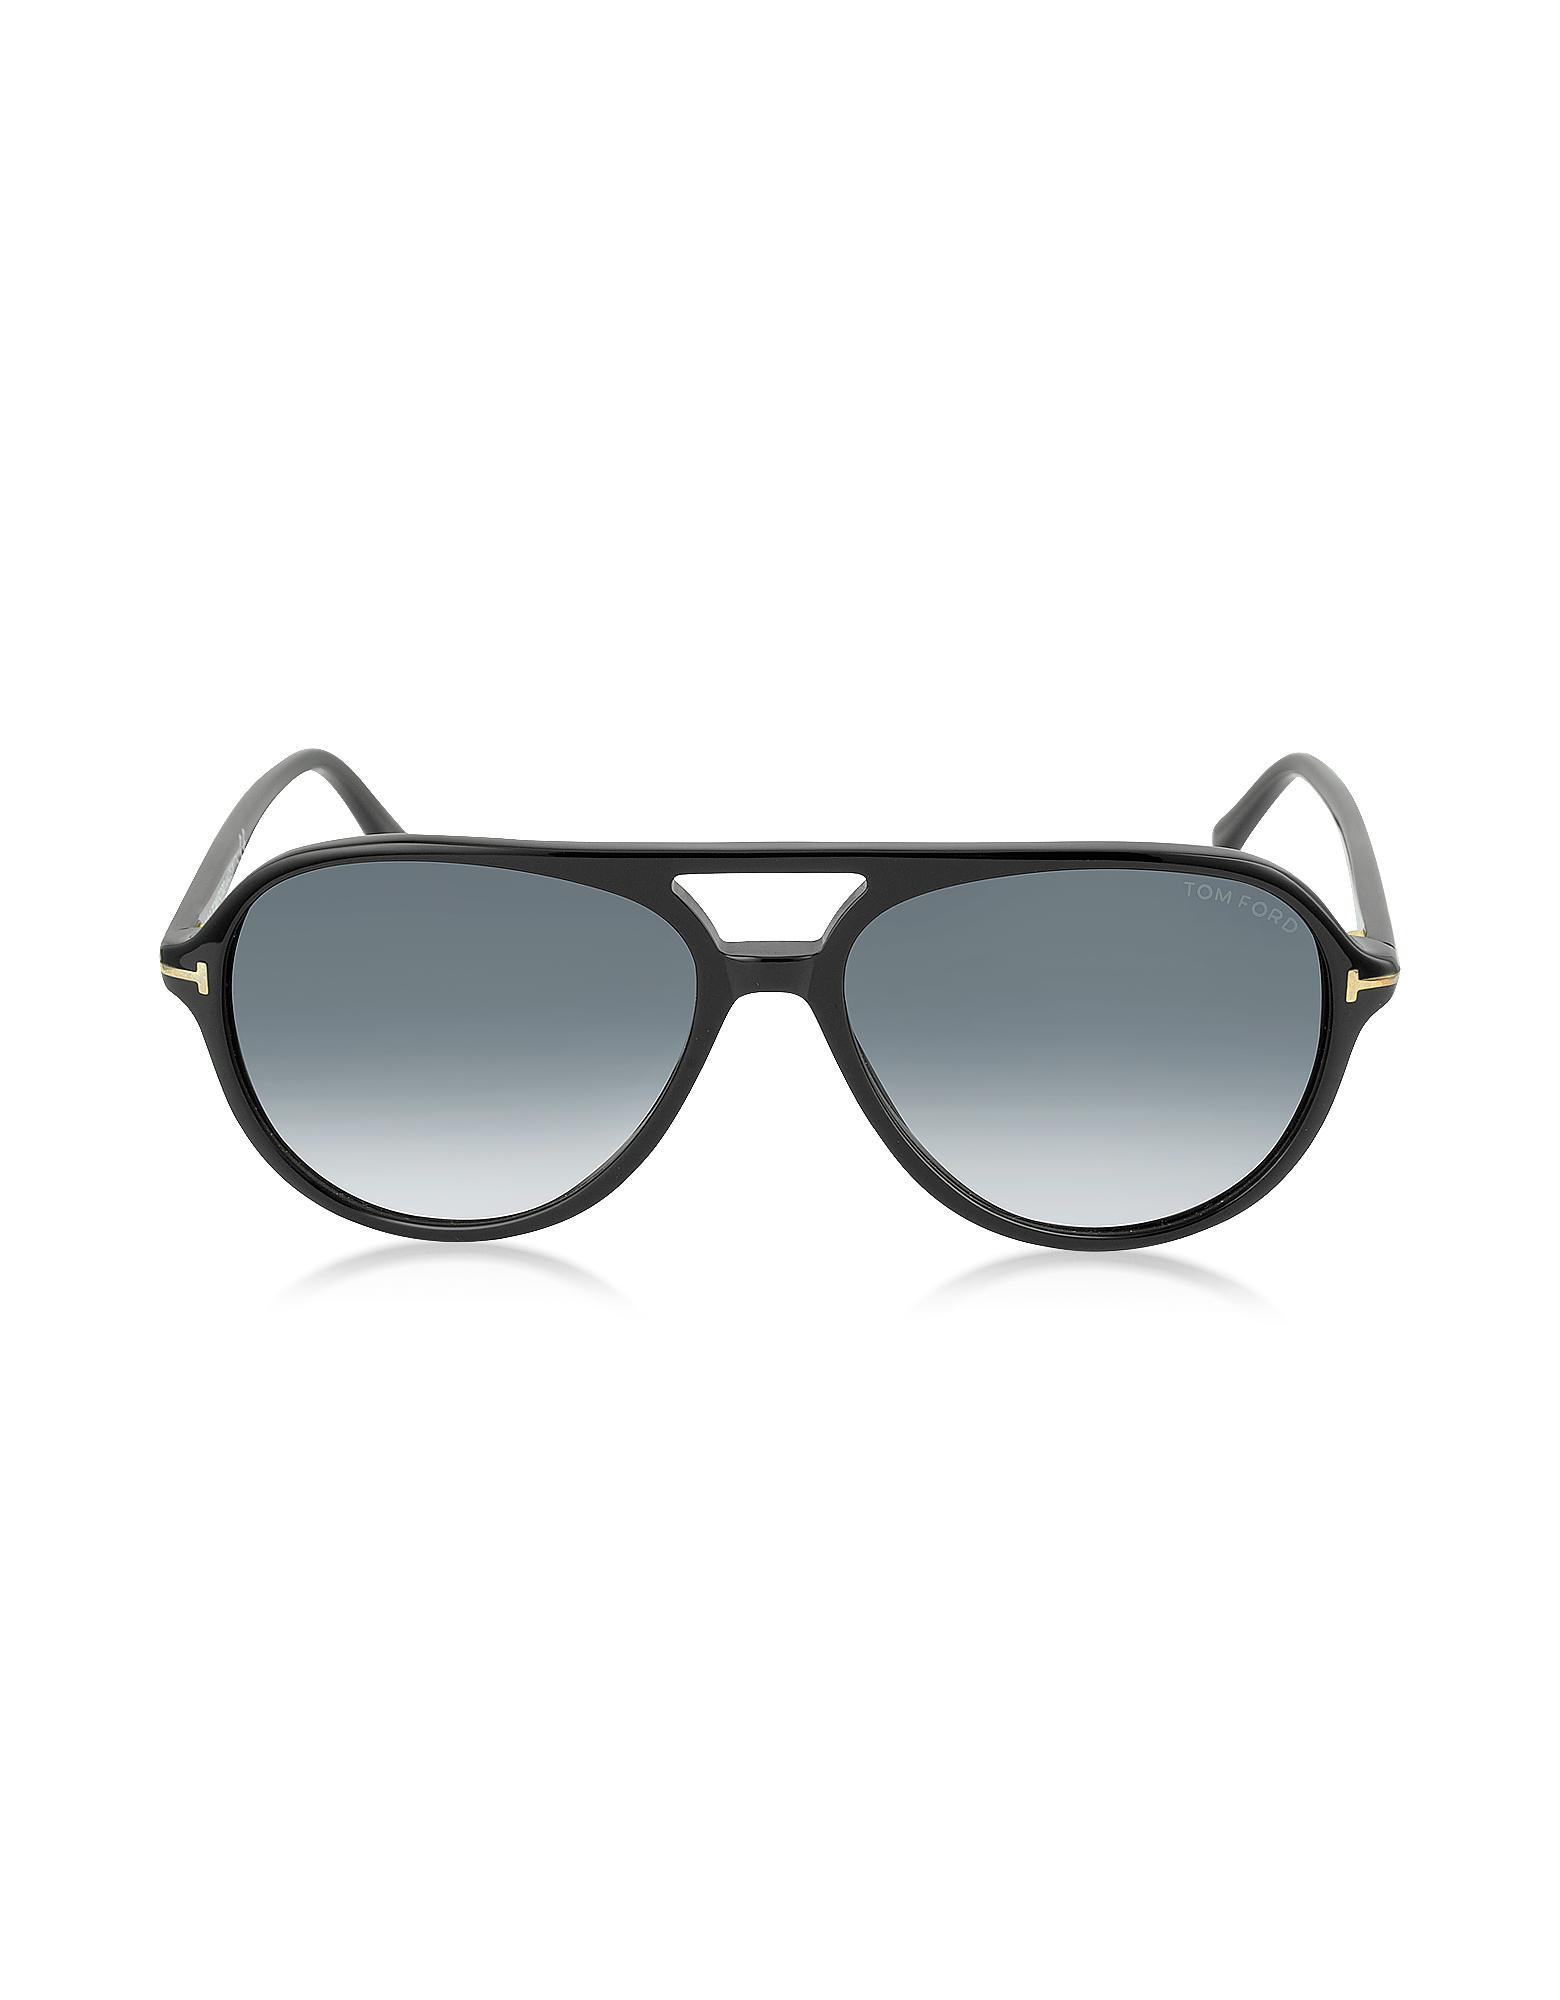 384cb27b09 JARED FT0331 Gafas de Sol de Acetato con Montura Estilo Aviador Tom ...